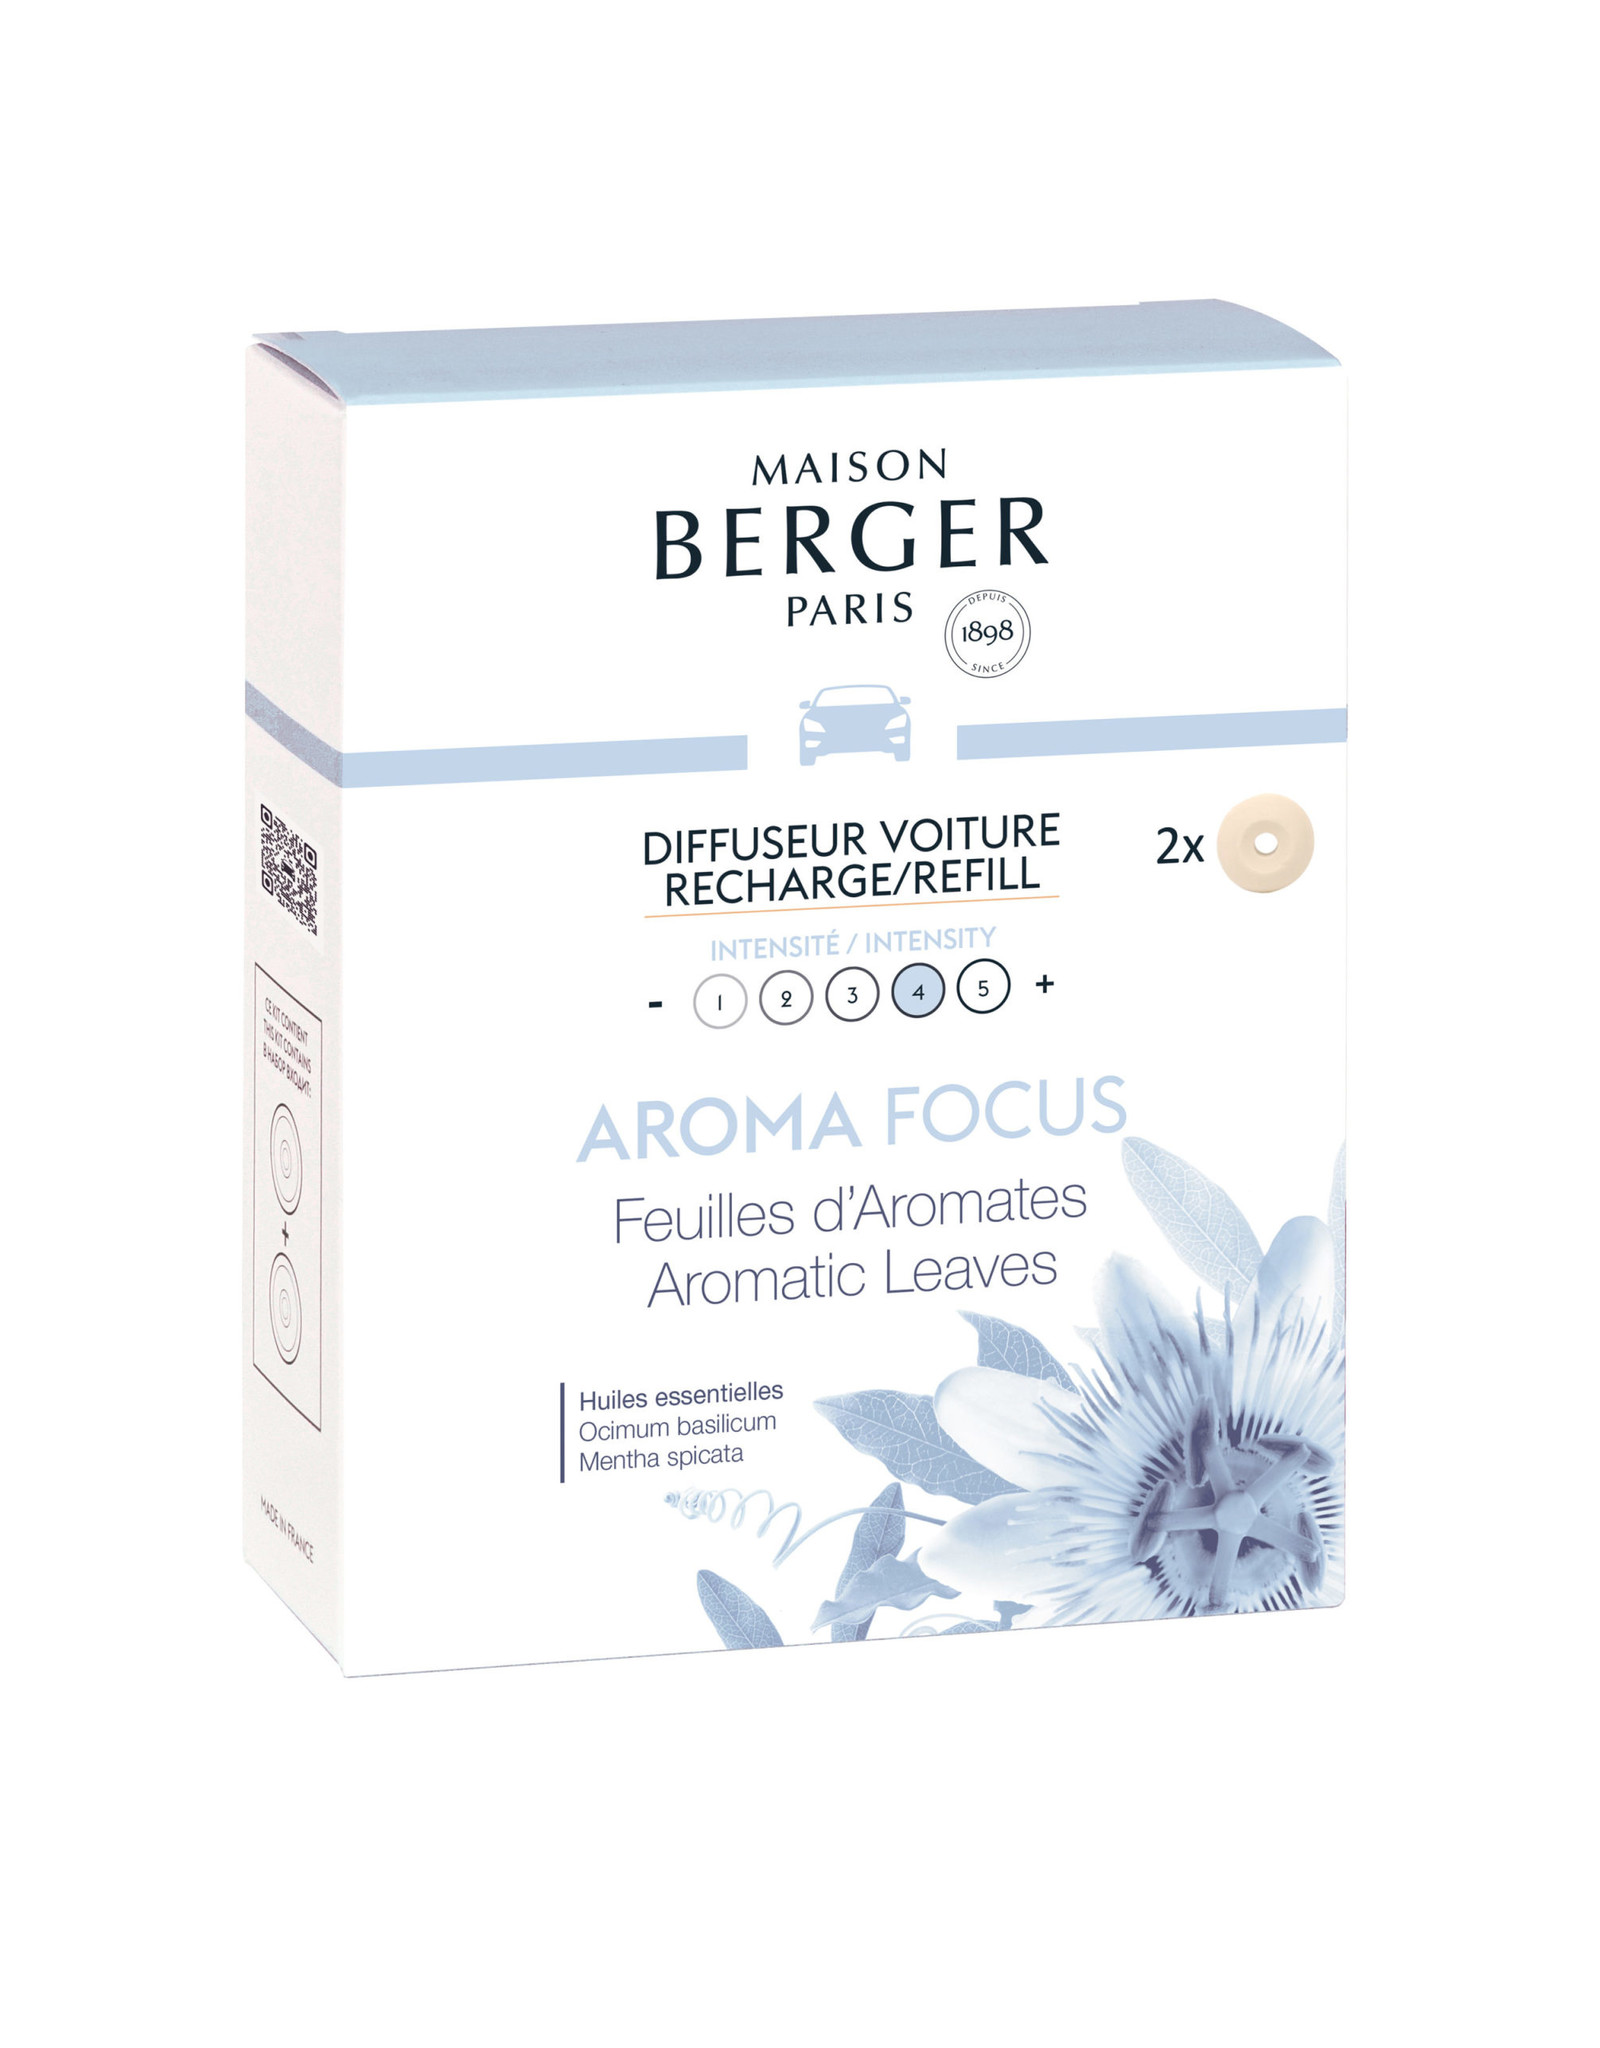 Maison Berger Maison Berger. Autoparfum navulling 2 stuks Aroma Focus - Feuilles d'Aromates / Aromatic Leaves